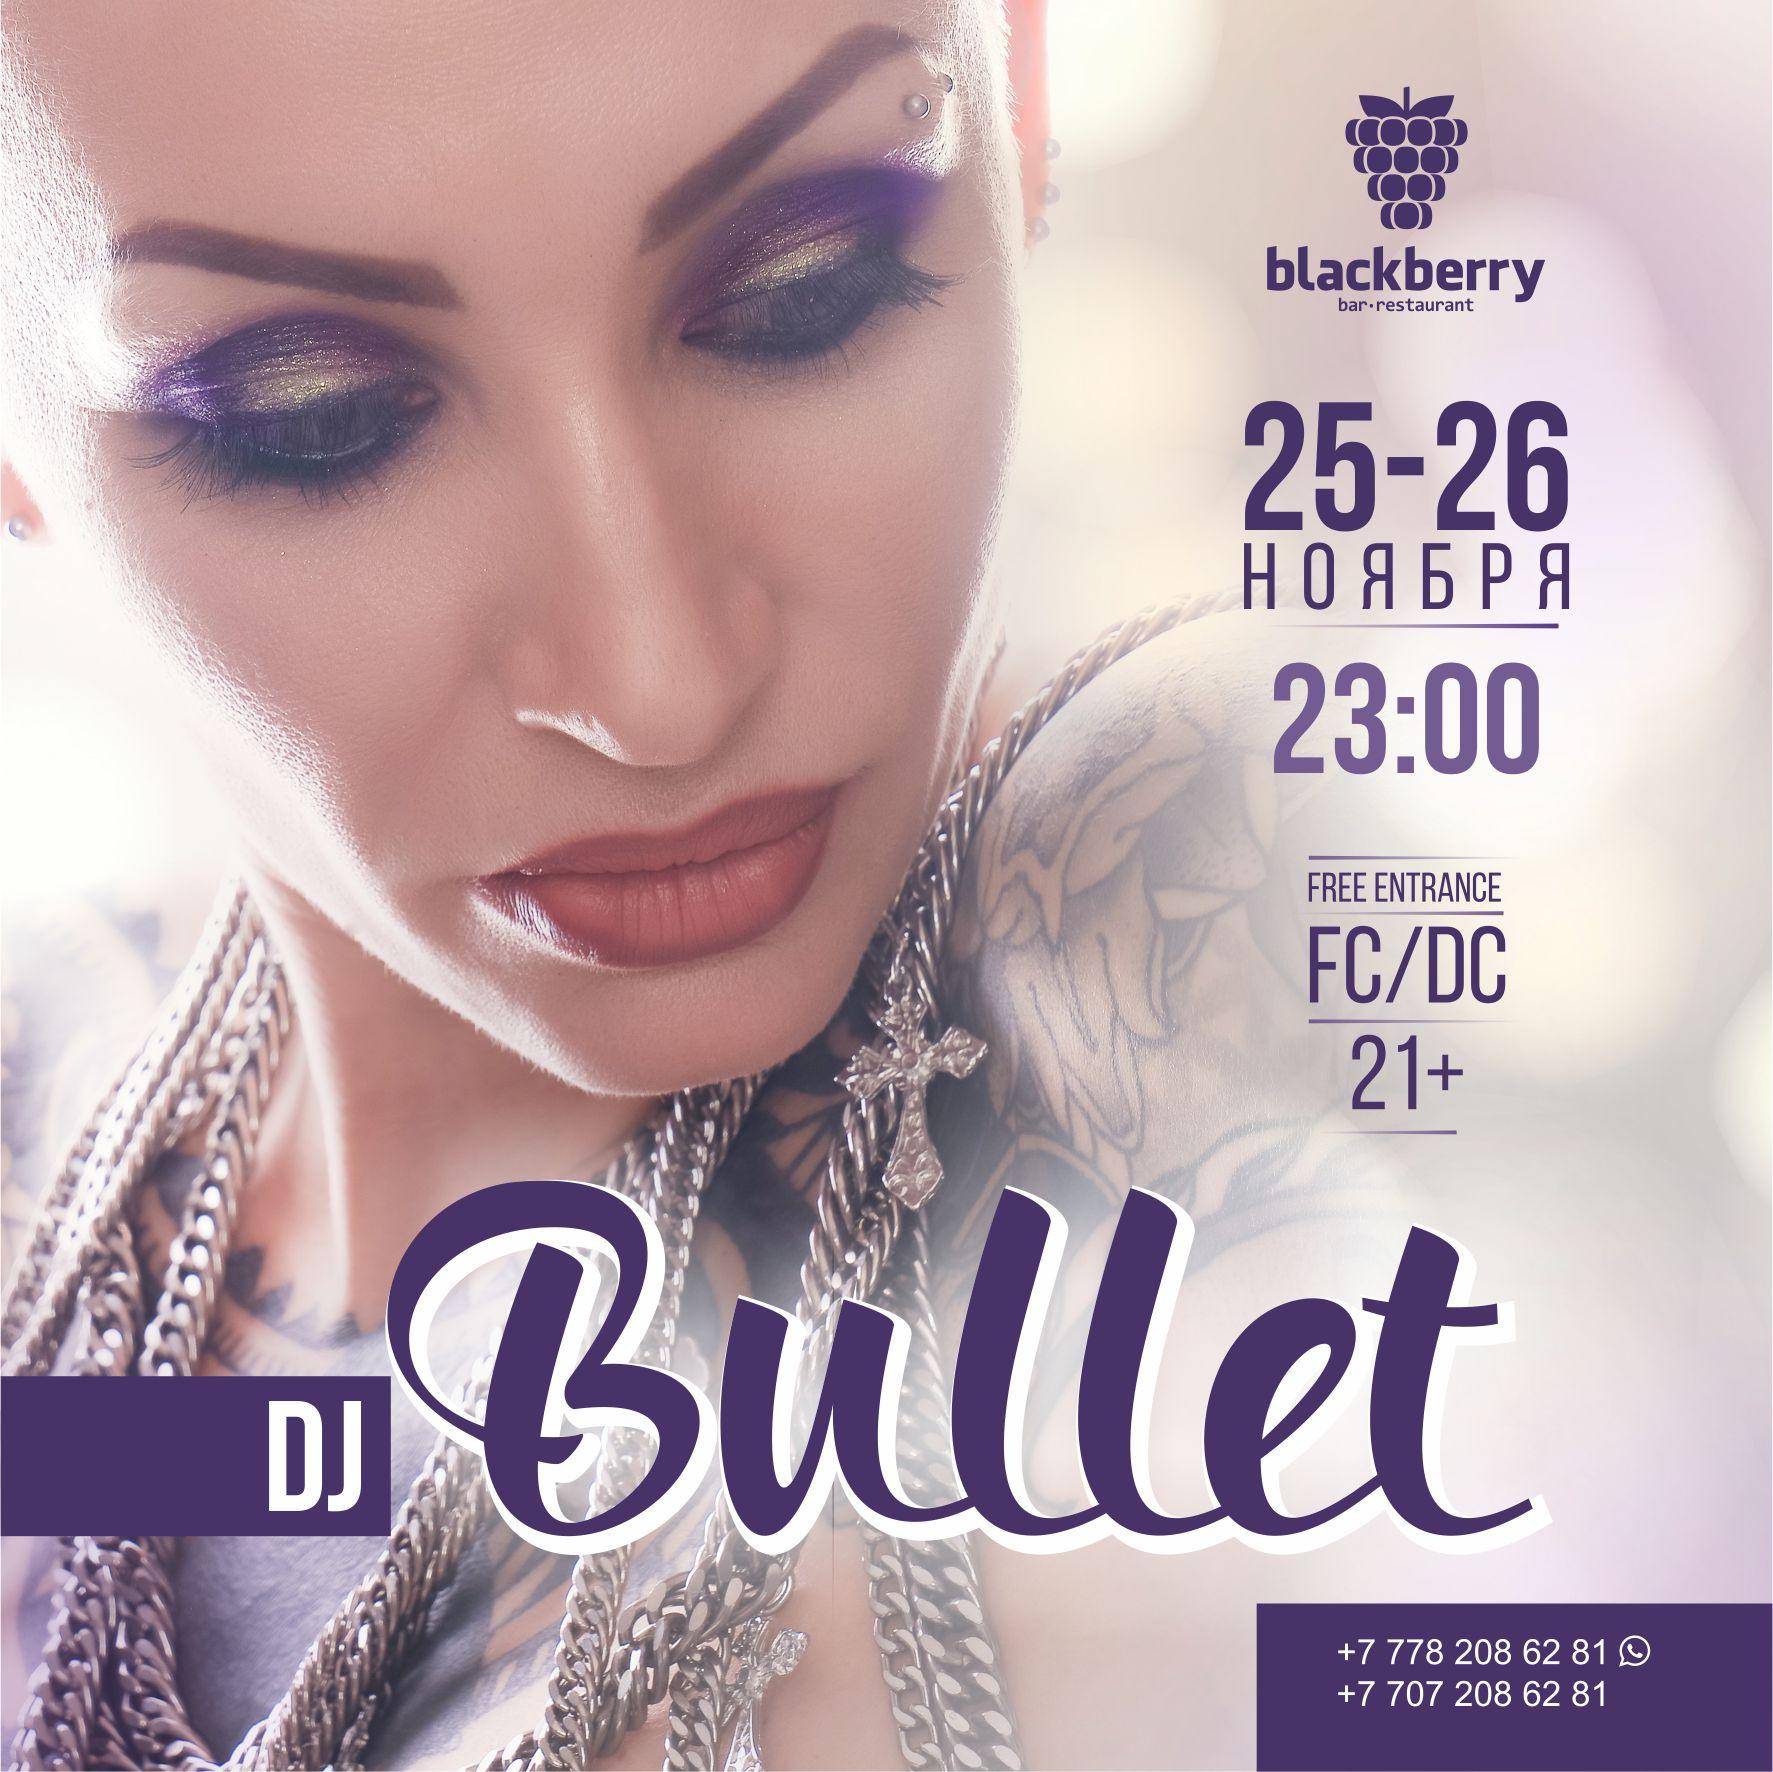 DJ Bullet в Blackberry Bar-restaurant